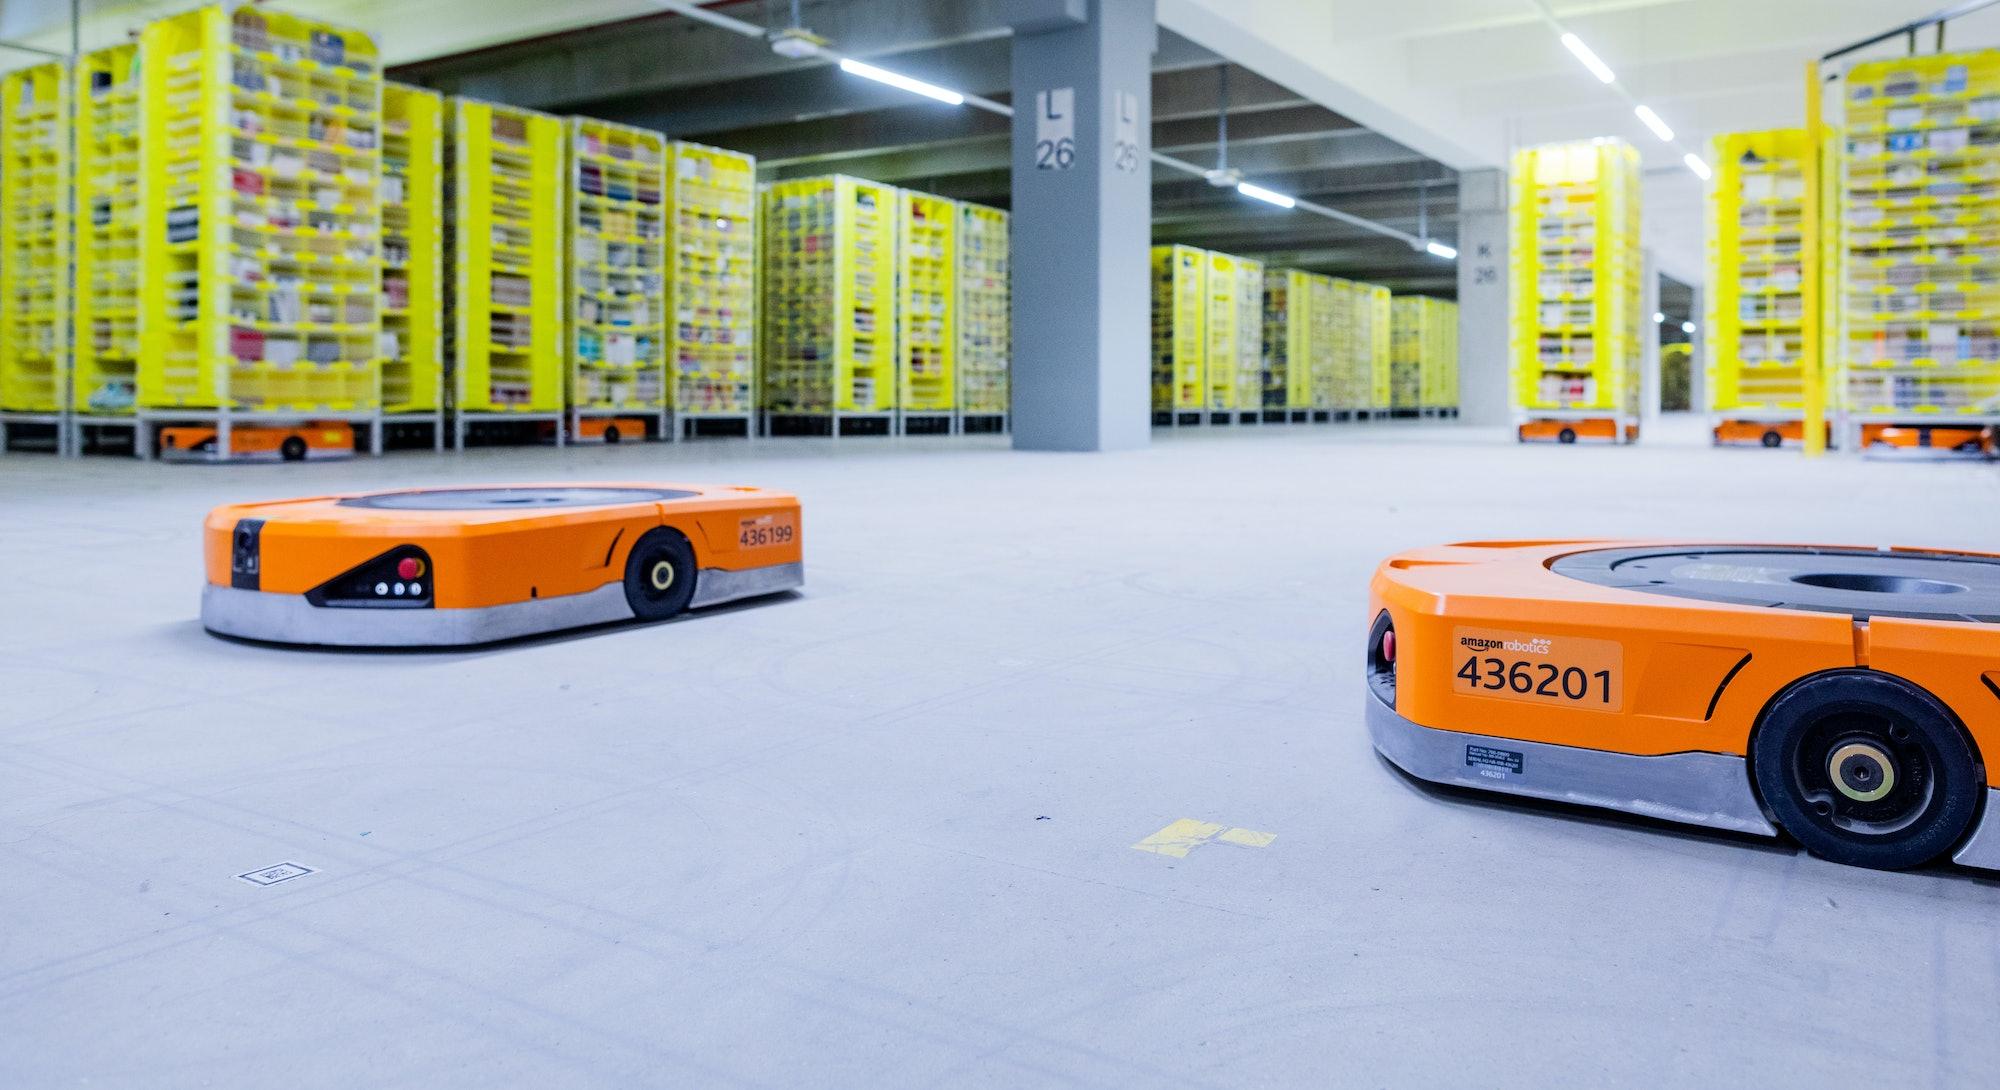 08 December 2020, North Rhine-Westphalia, Mönchengladbach: Robots transport goods to the employees i...